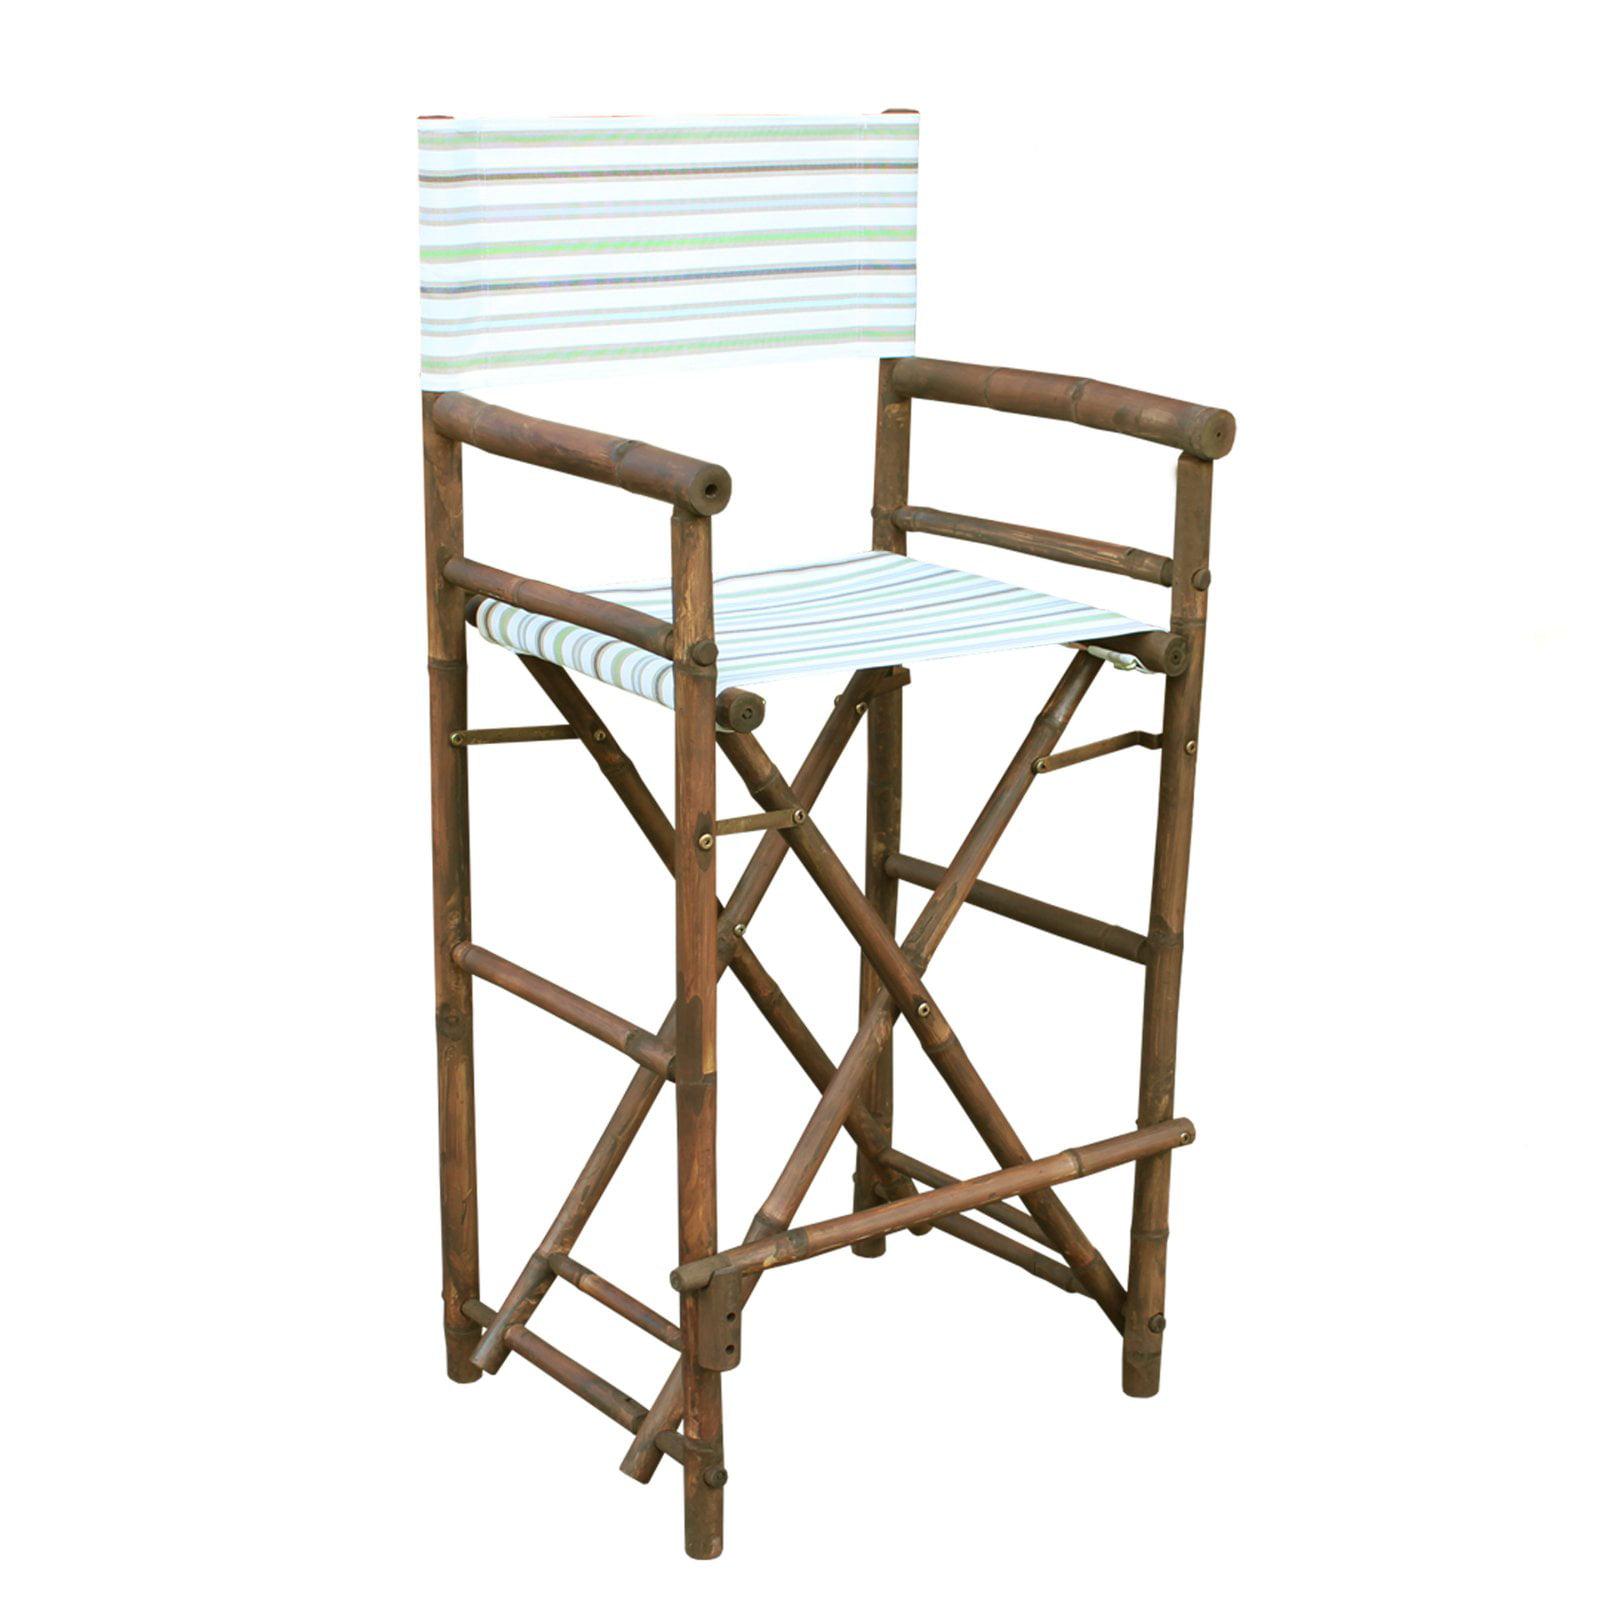 Statra Bamboo Indoor Outdoor Canvas Directors Chair Barstool - Set of 2